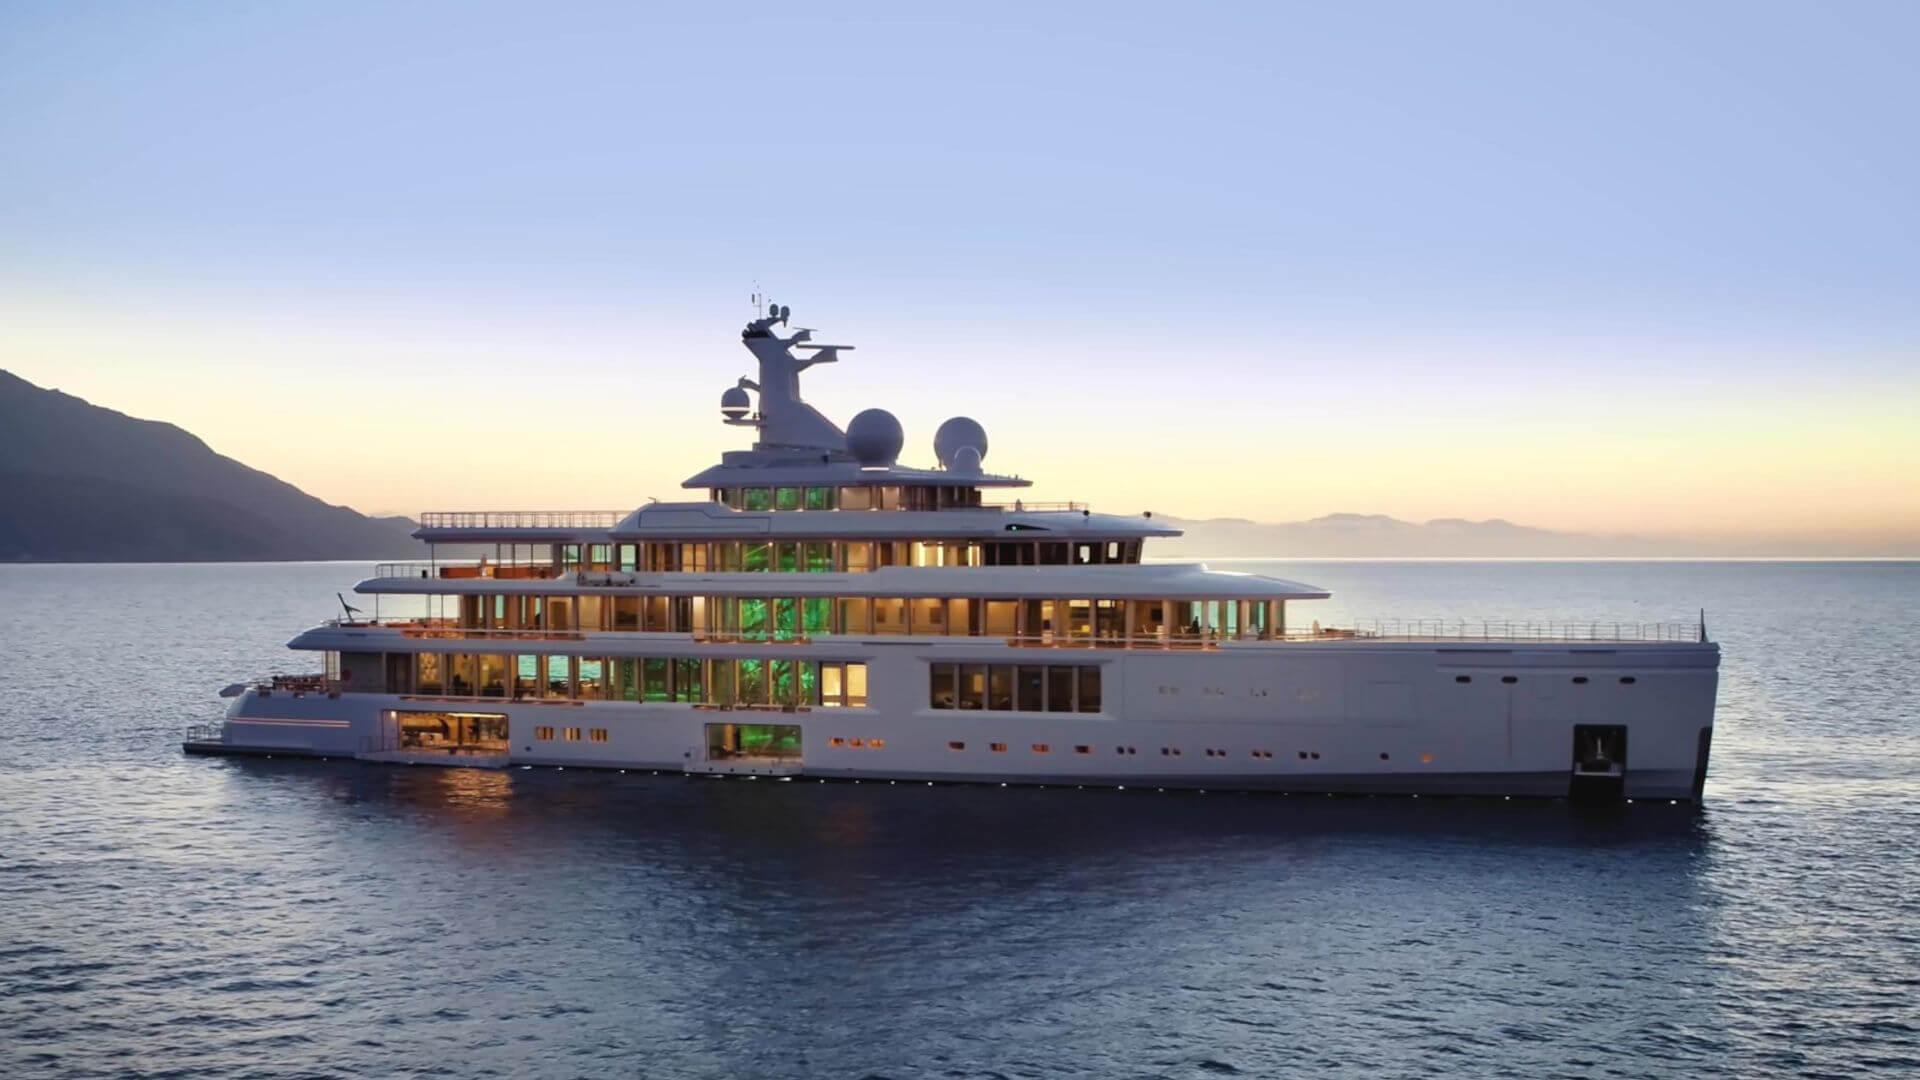 Luminosity Benetti Superyacht Evening Open Decks and Lighting